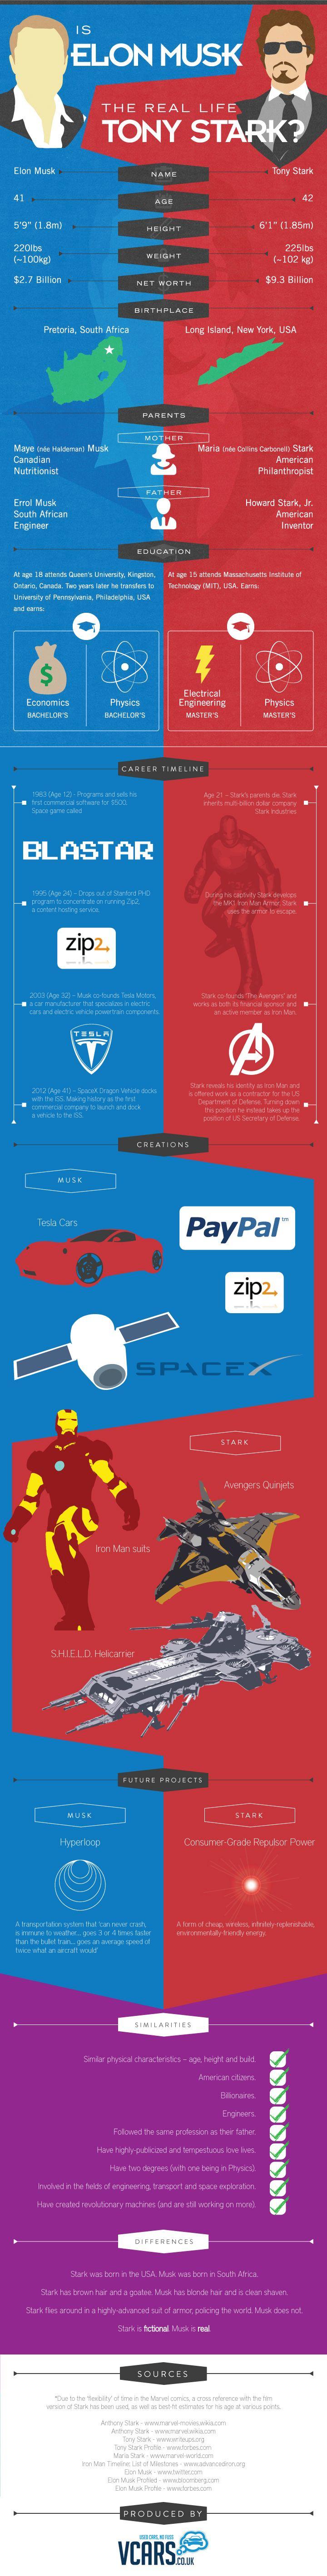 Infographic: Is Elon Musk the Real Life Tony Stark?